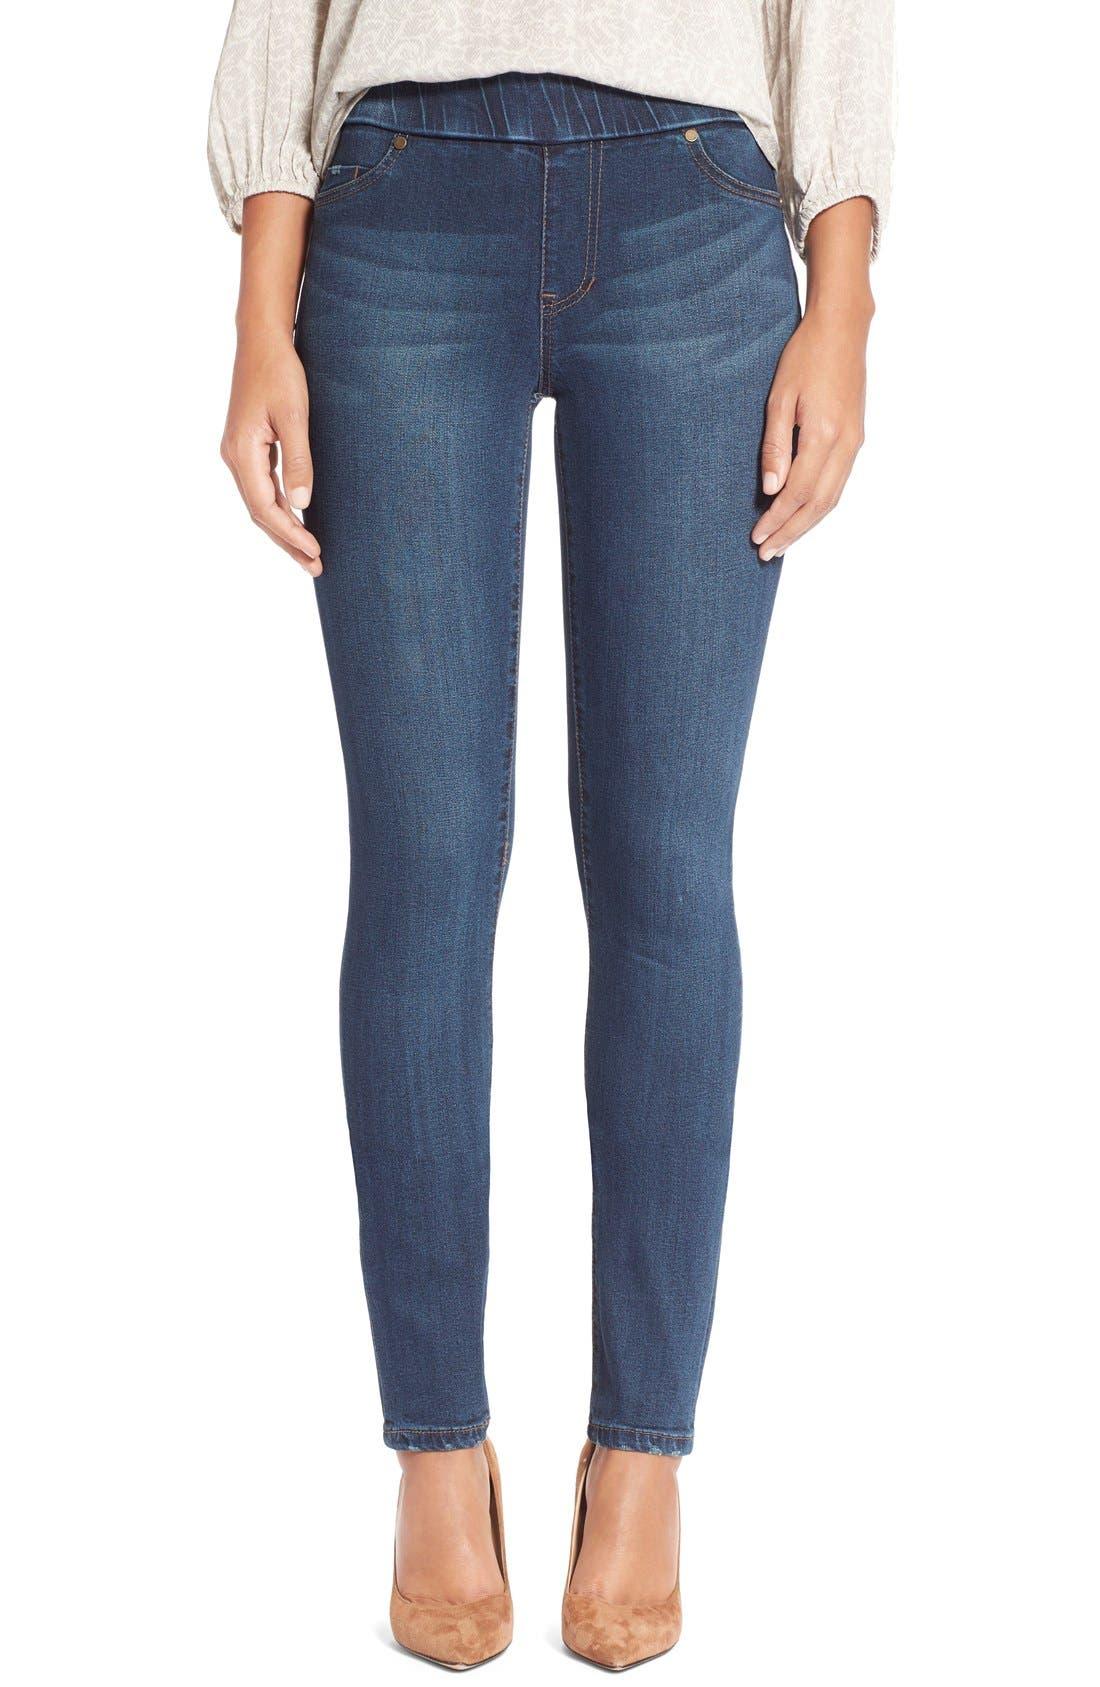 Sienna Pull-On Knit Denim Leggings,                         Main,                         color, Petrol Wash